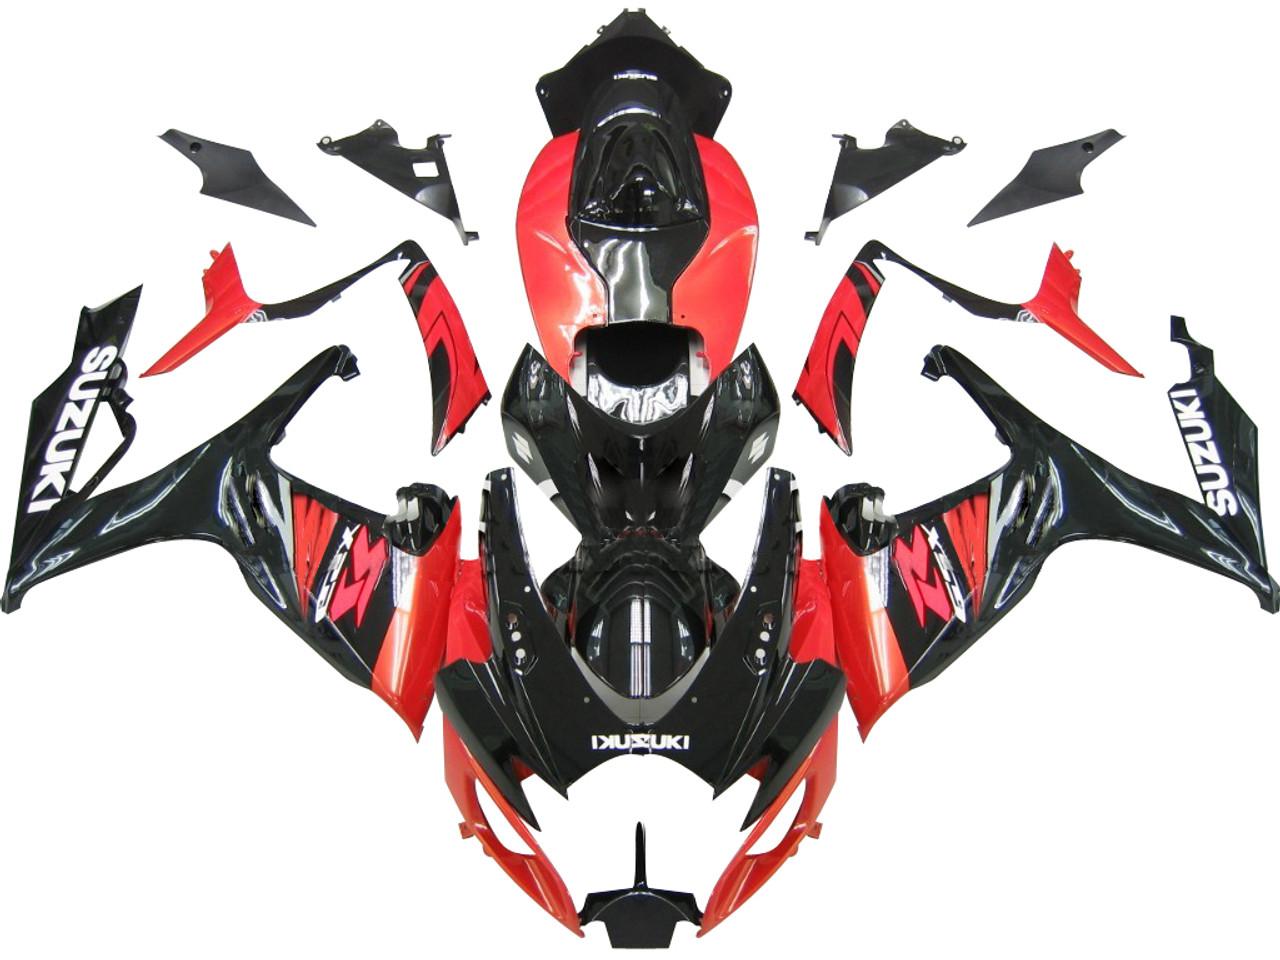 Fairings Suzuki Gsxr 600 750 Black Red Racing 2006 2007 Timing Belt 07